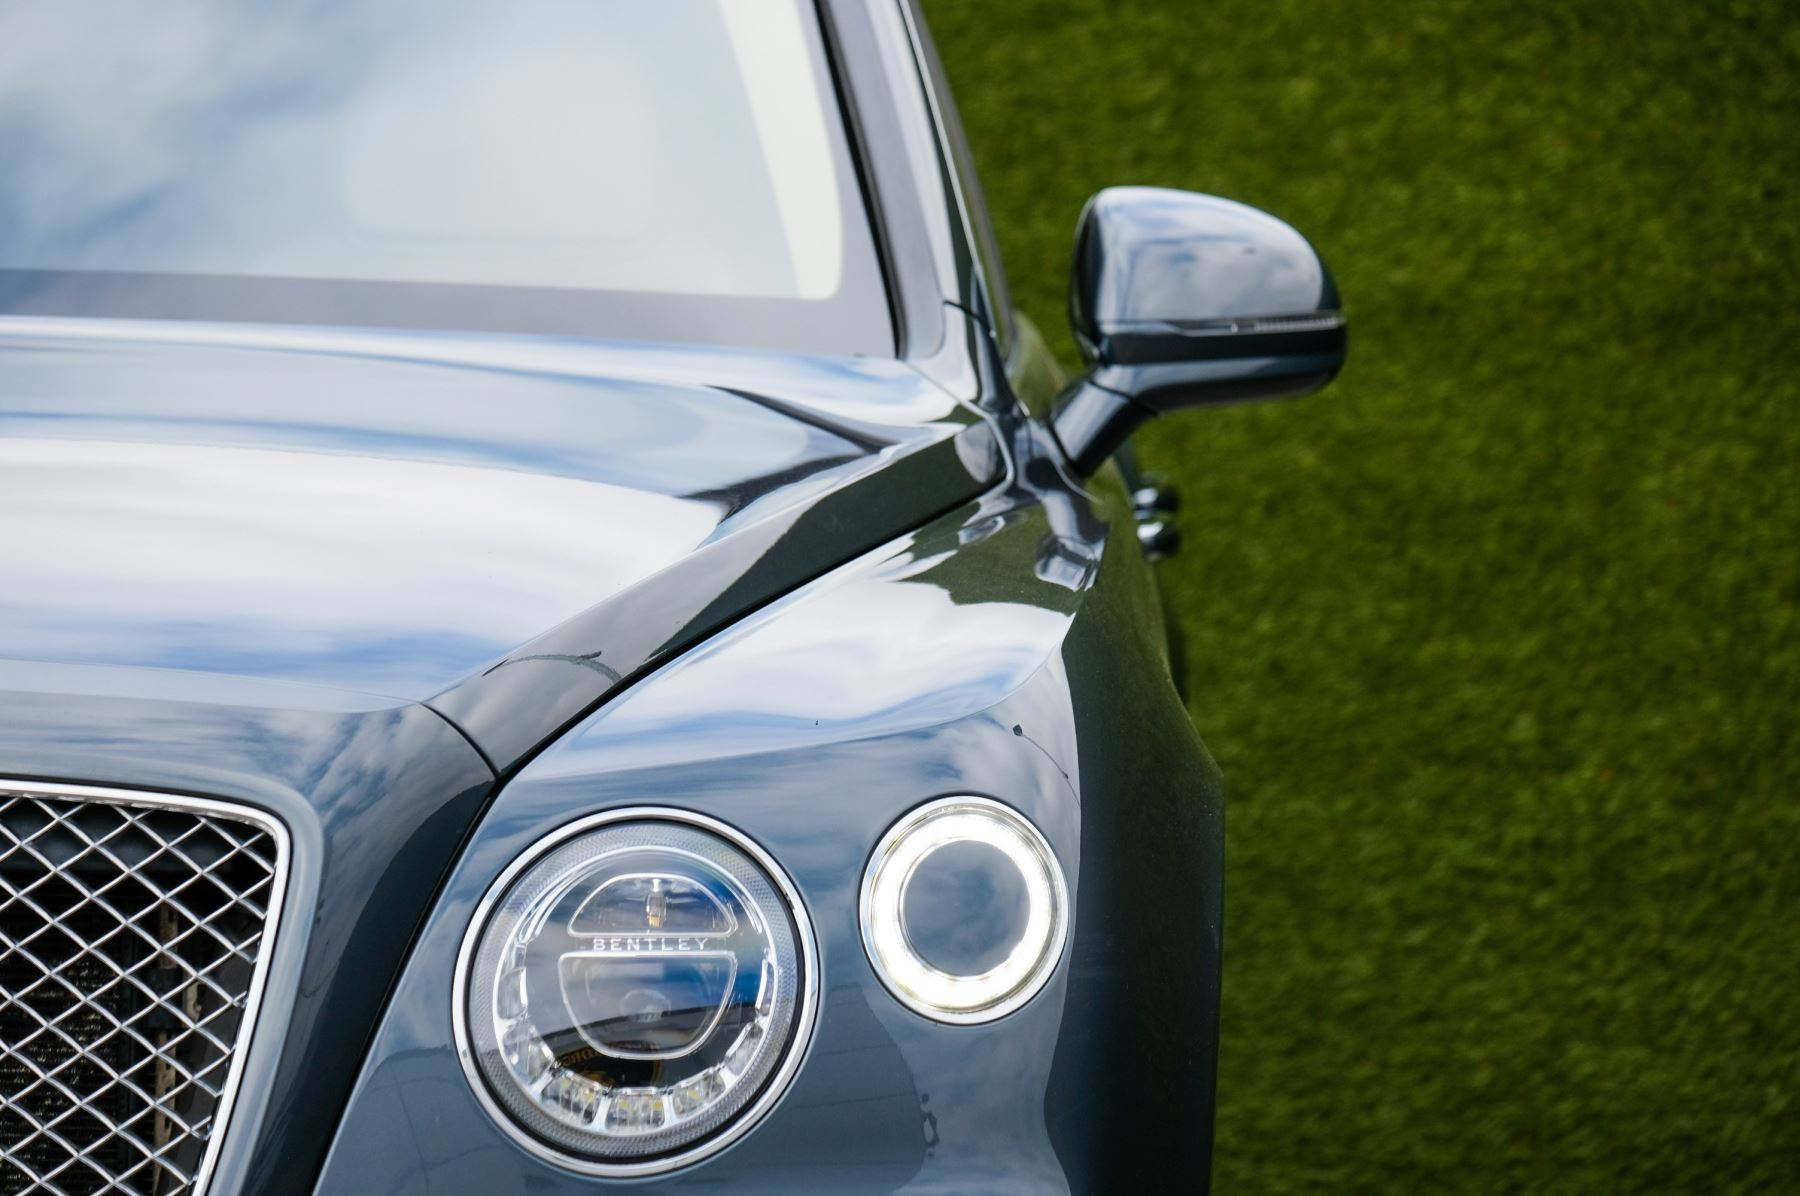 Bentley Bentayga 4.0 V8 5dr - Mulliner Driving Specification - City & Tour Specification image 6